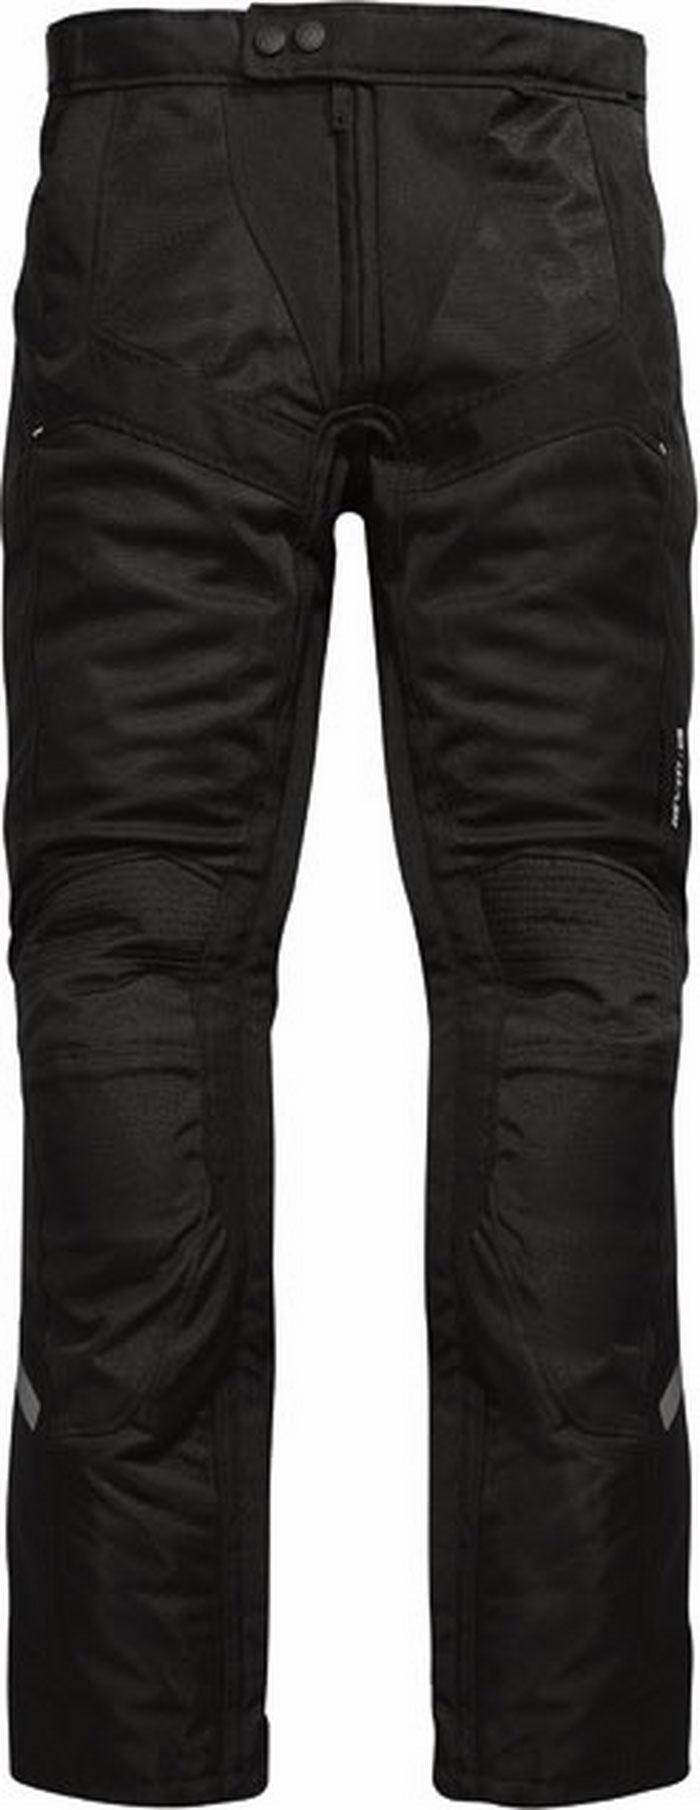 Pantaloni moto donna estivi Rev'it Airwave Ladies neri